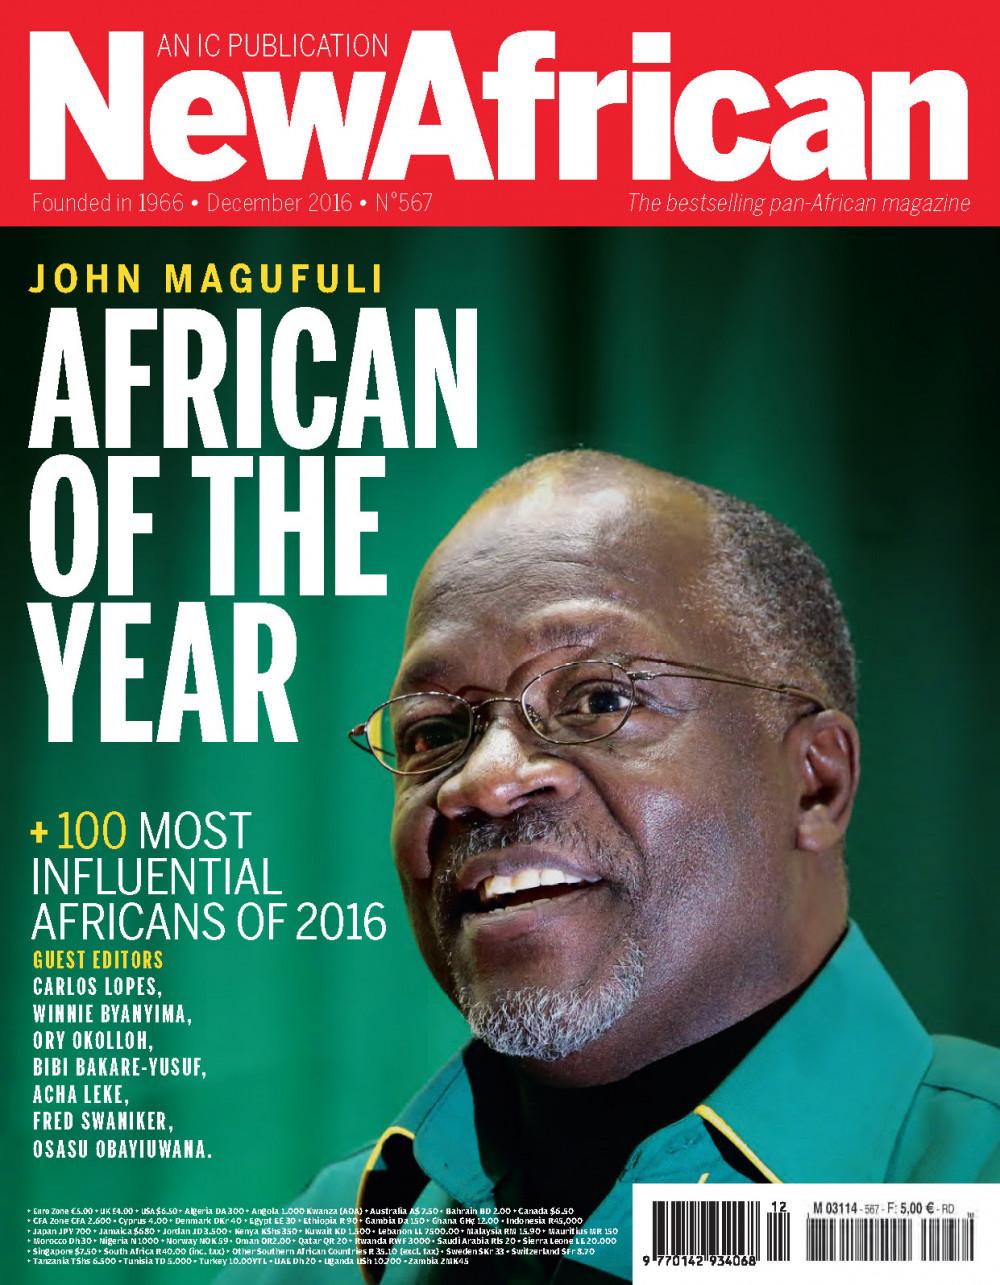 President Magufuli of Tanzania named New African Magazine